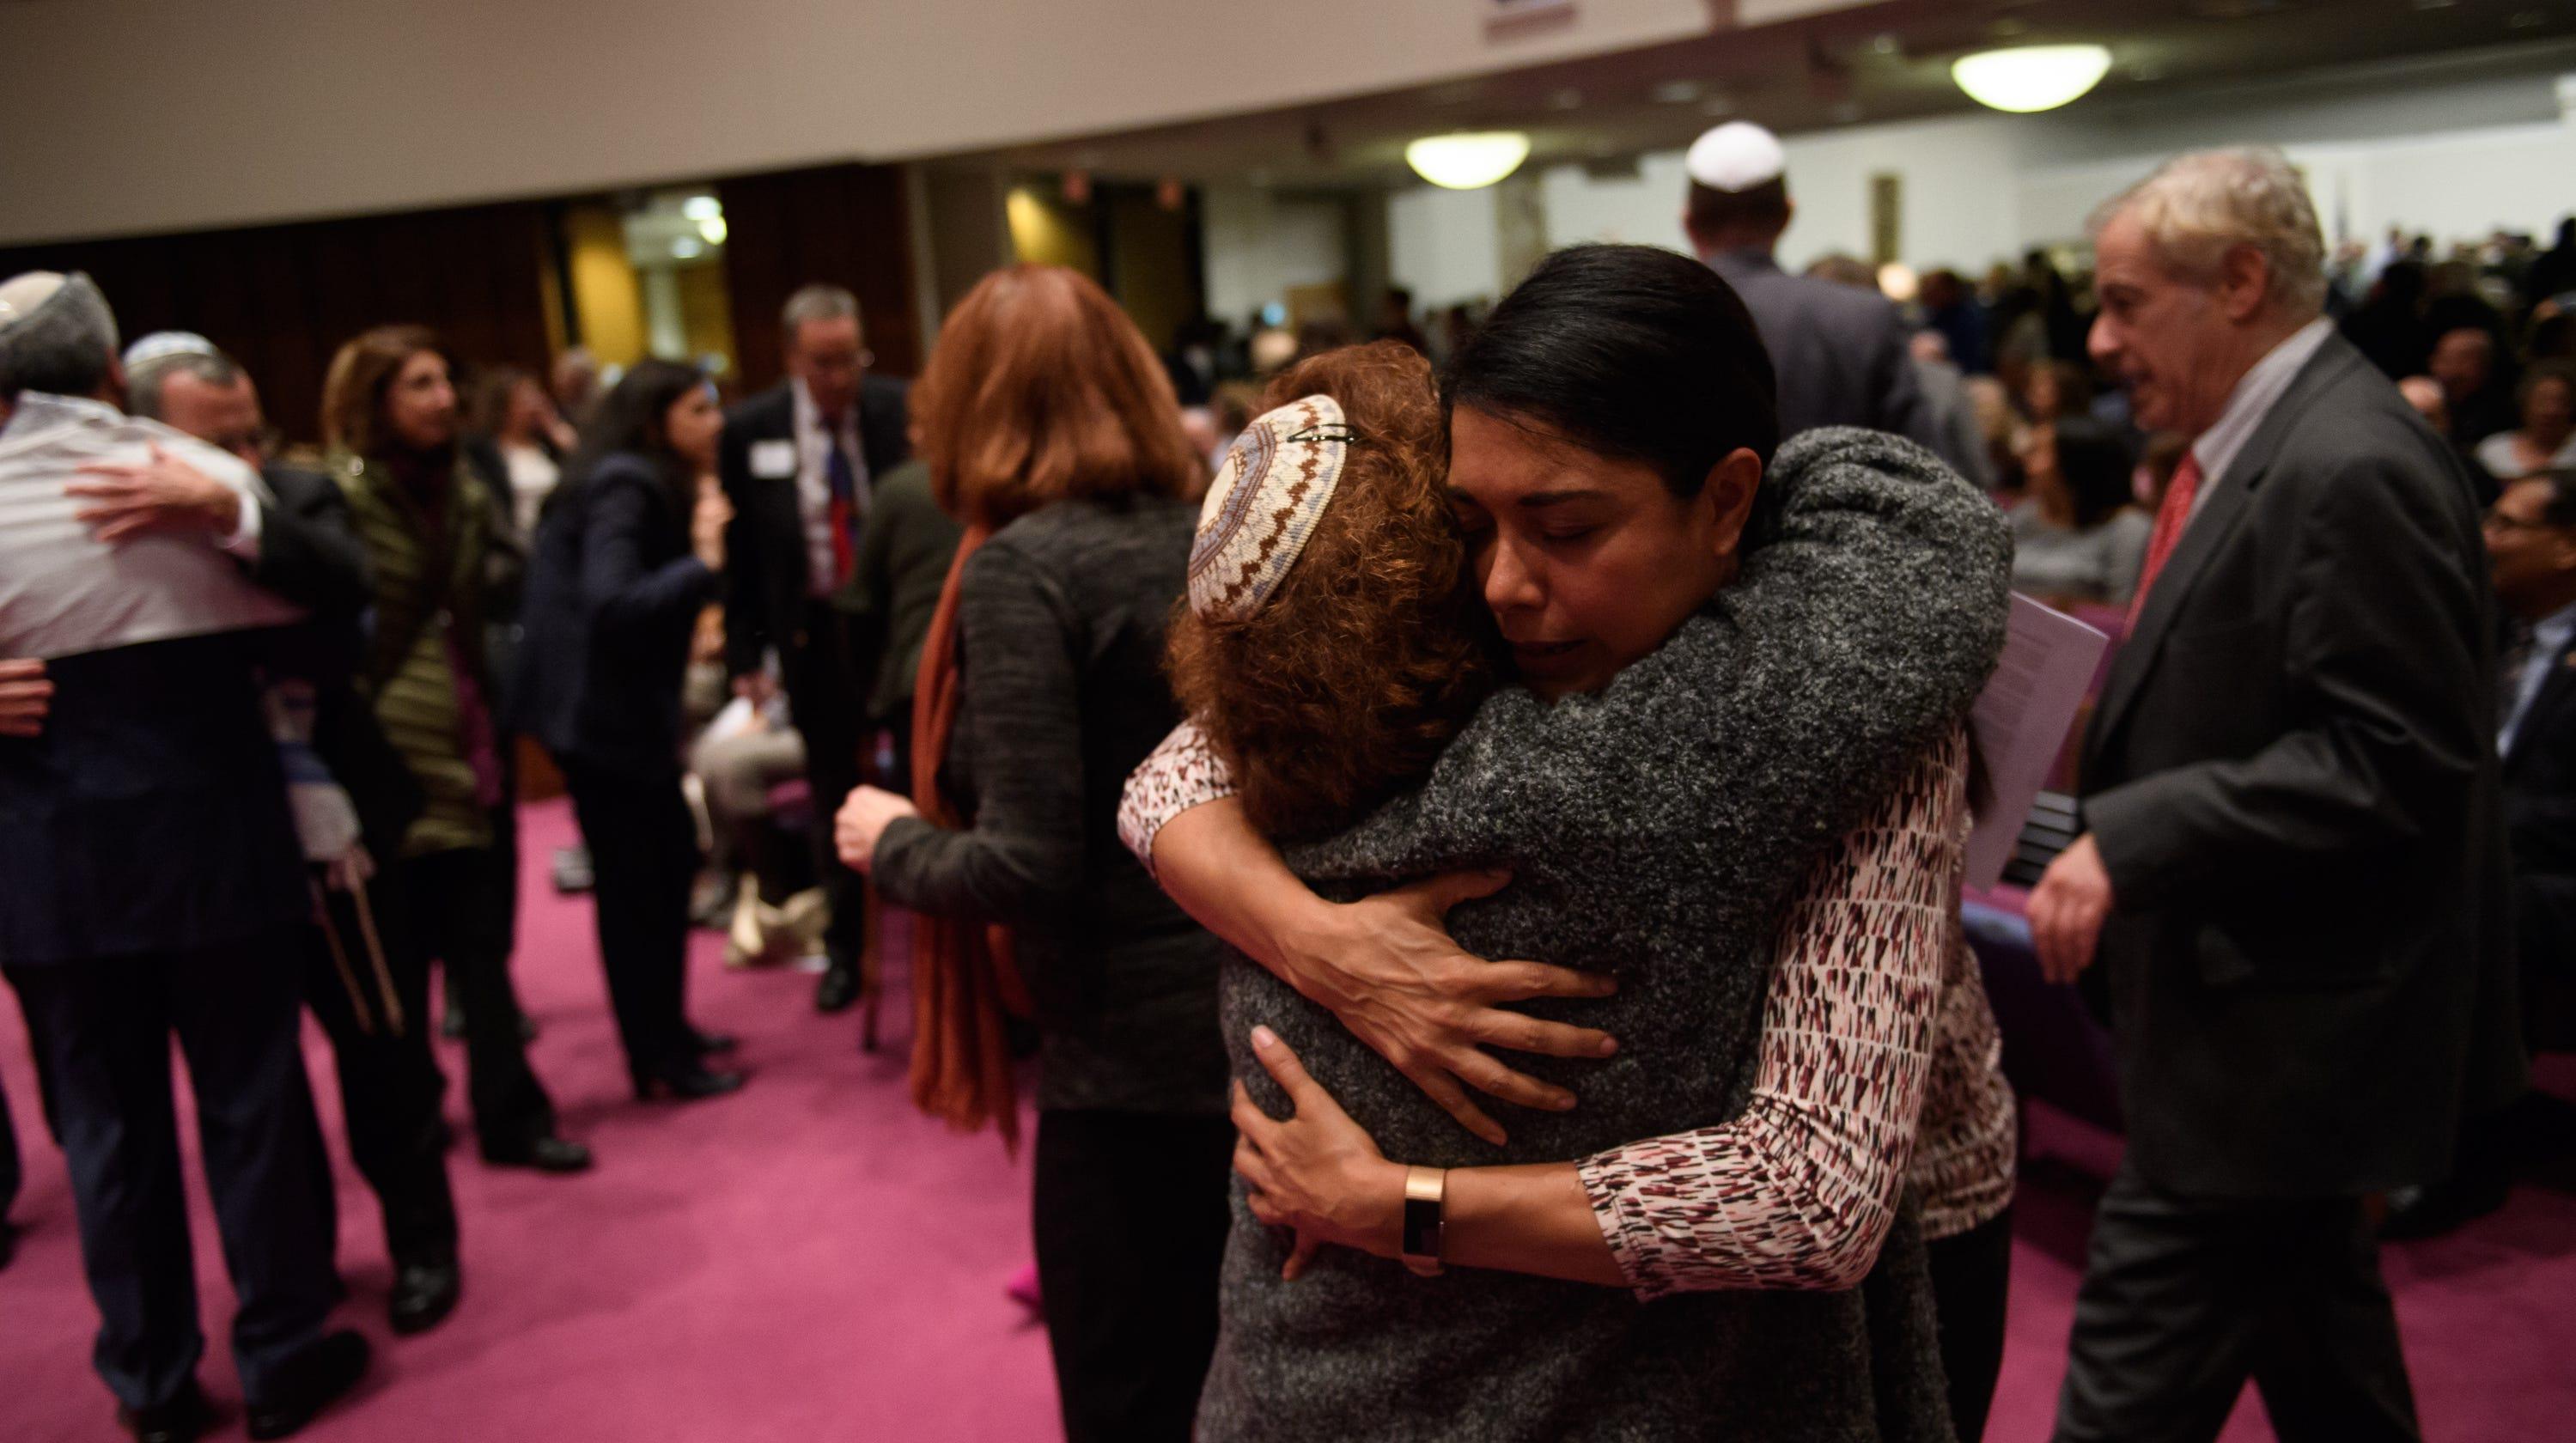 Pittsburgh synagogue shooting: Shabat service, vigils for